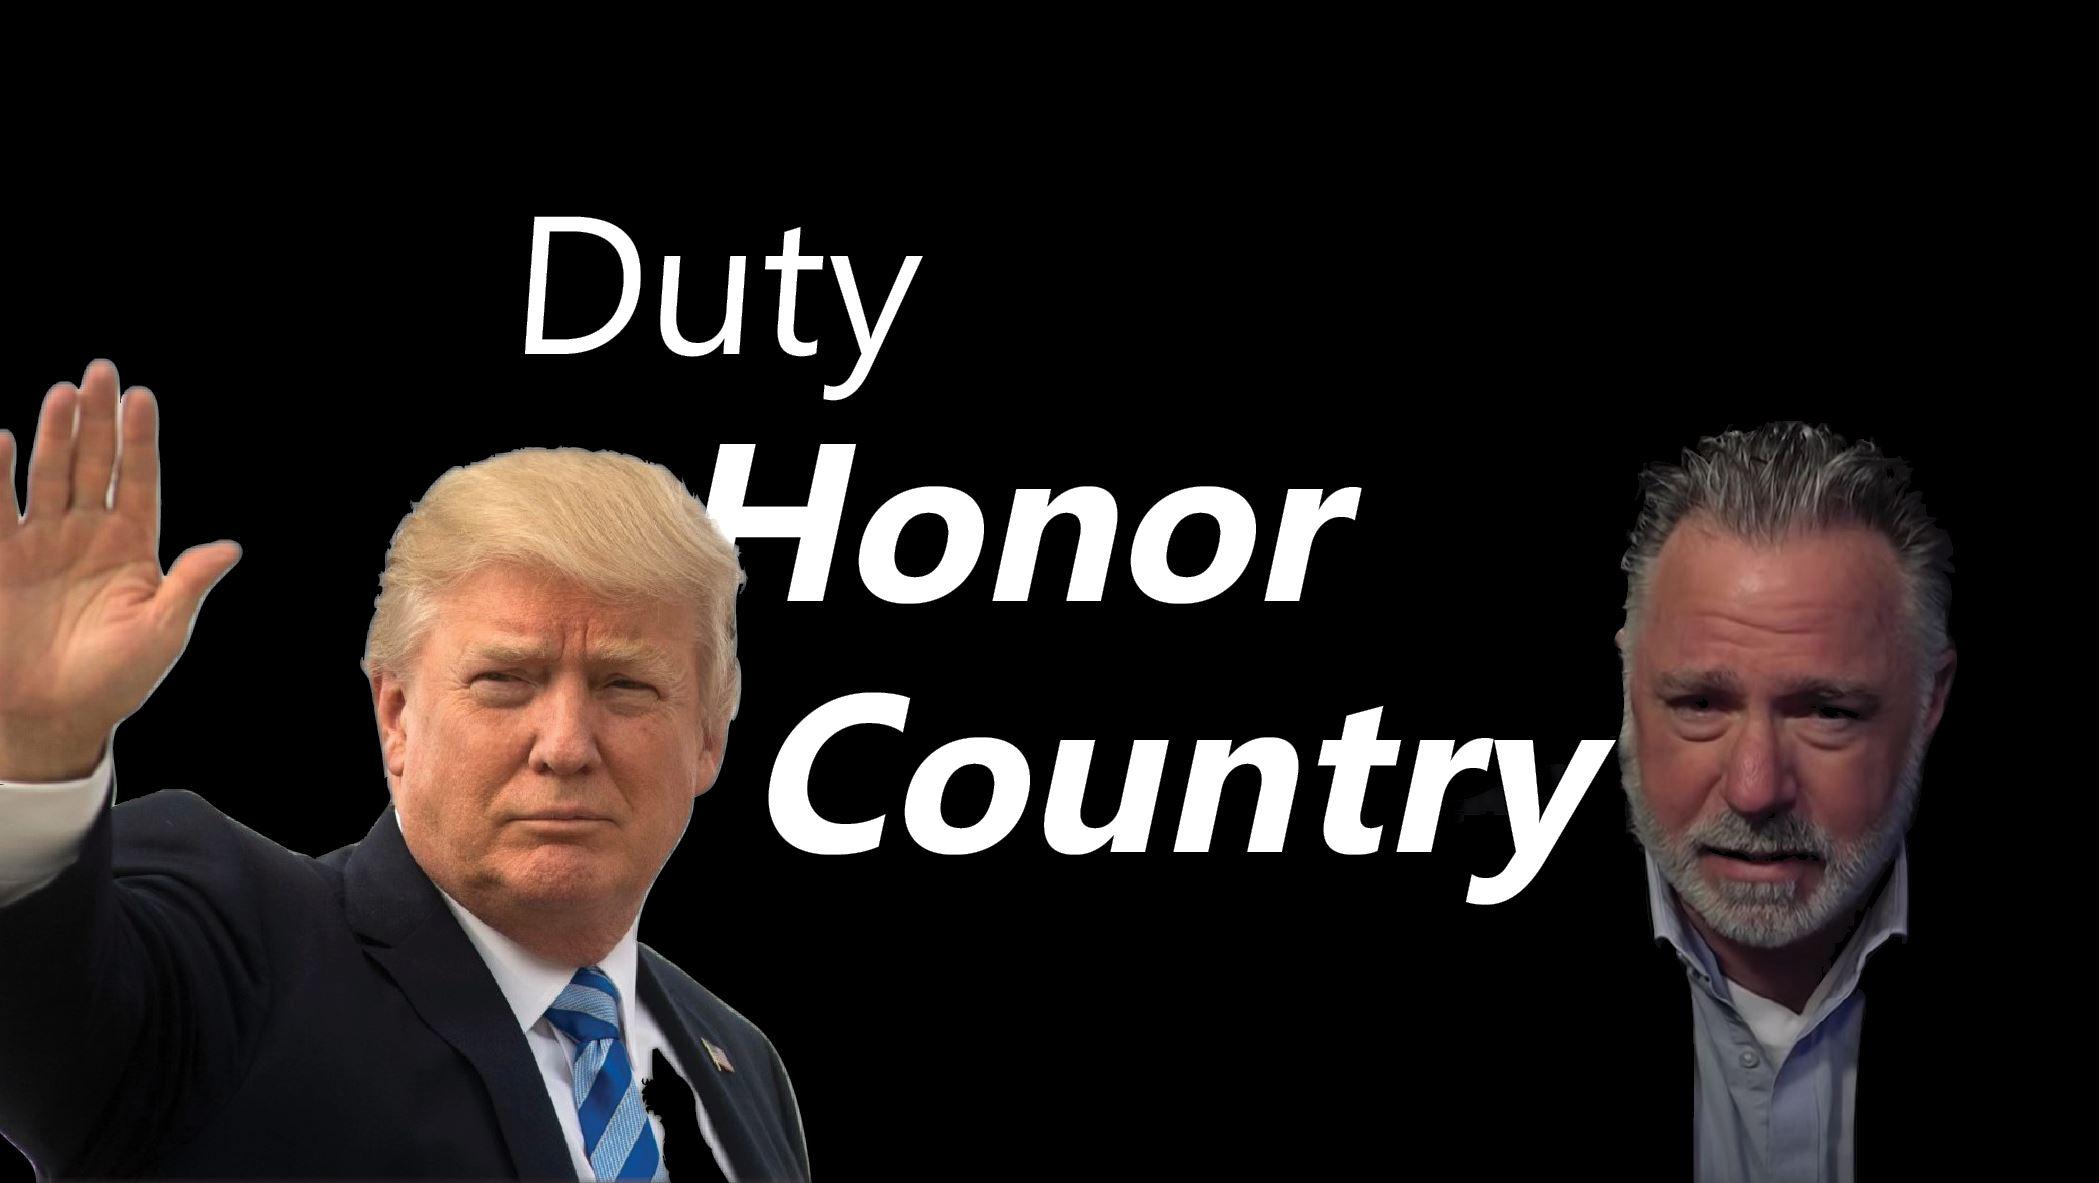 tnail duty honor final